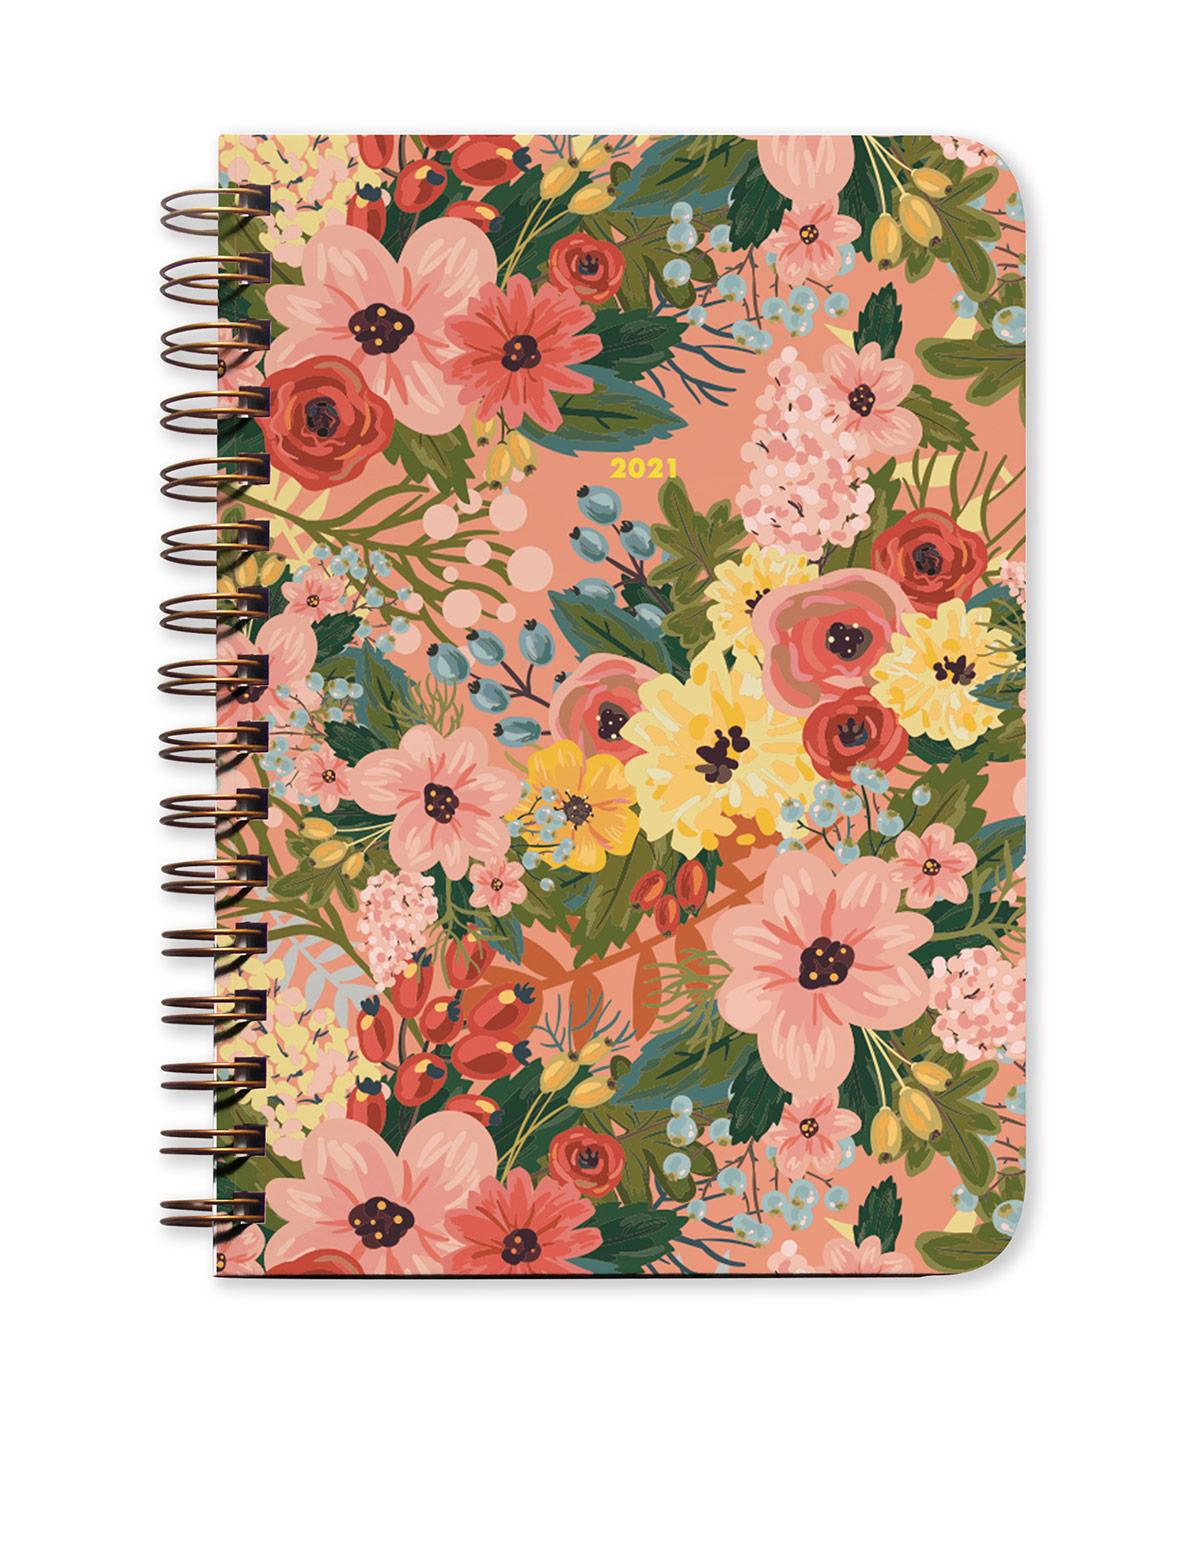 Pink Wildflowers 2021 Agenda